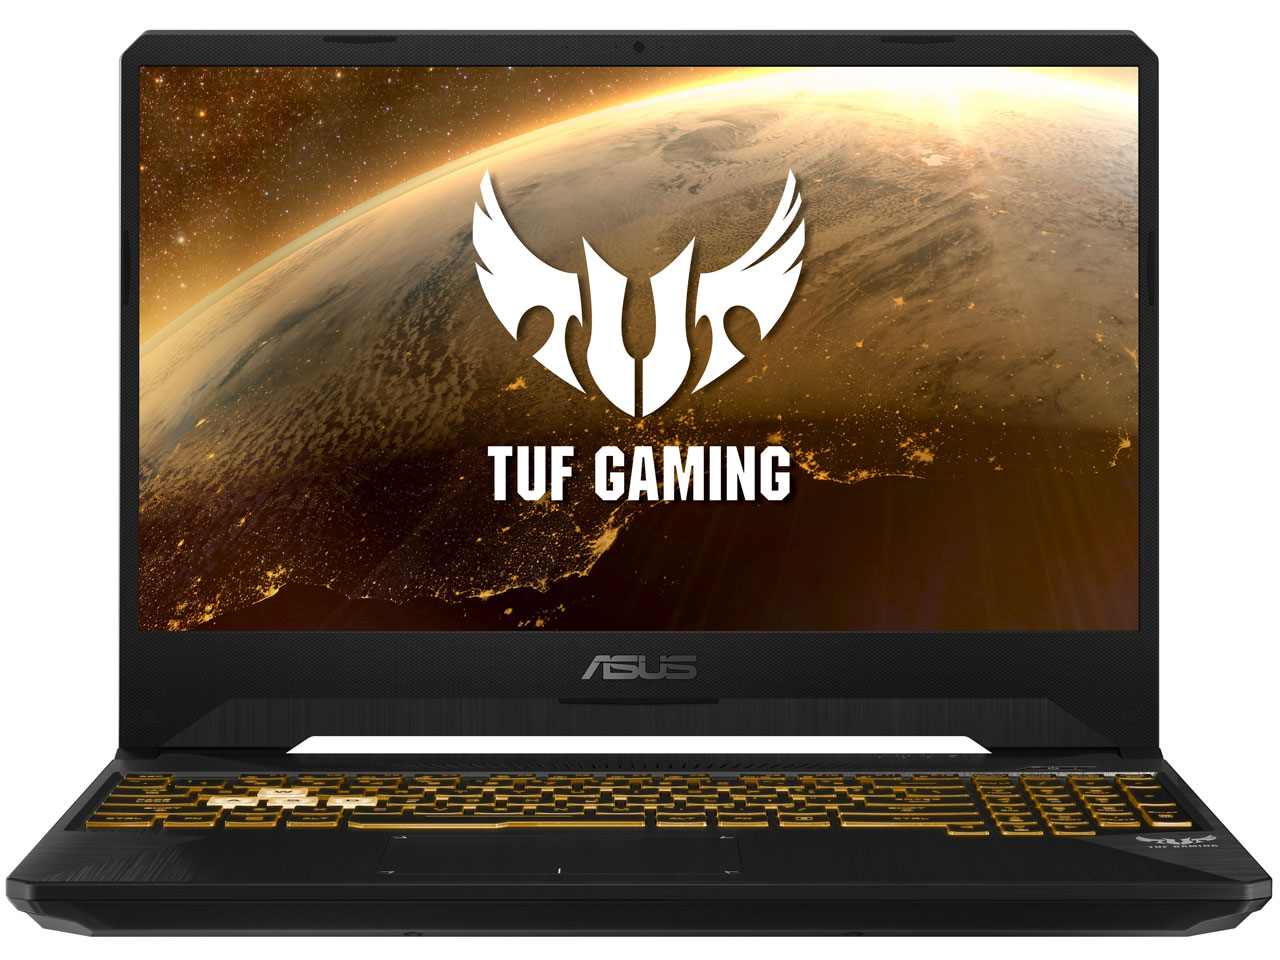 ASUS TUF Gaming FX505GD FX505GD-I7G1050(15.6型液晶搭載 Core i7搭載 Windows 10 Home 64bit)GTX1050搭載